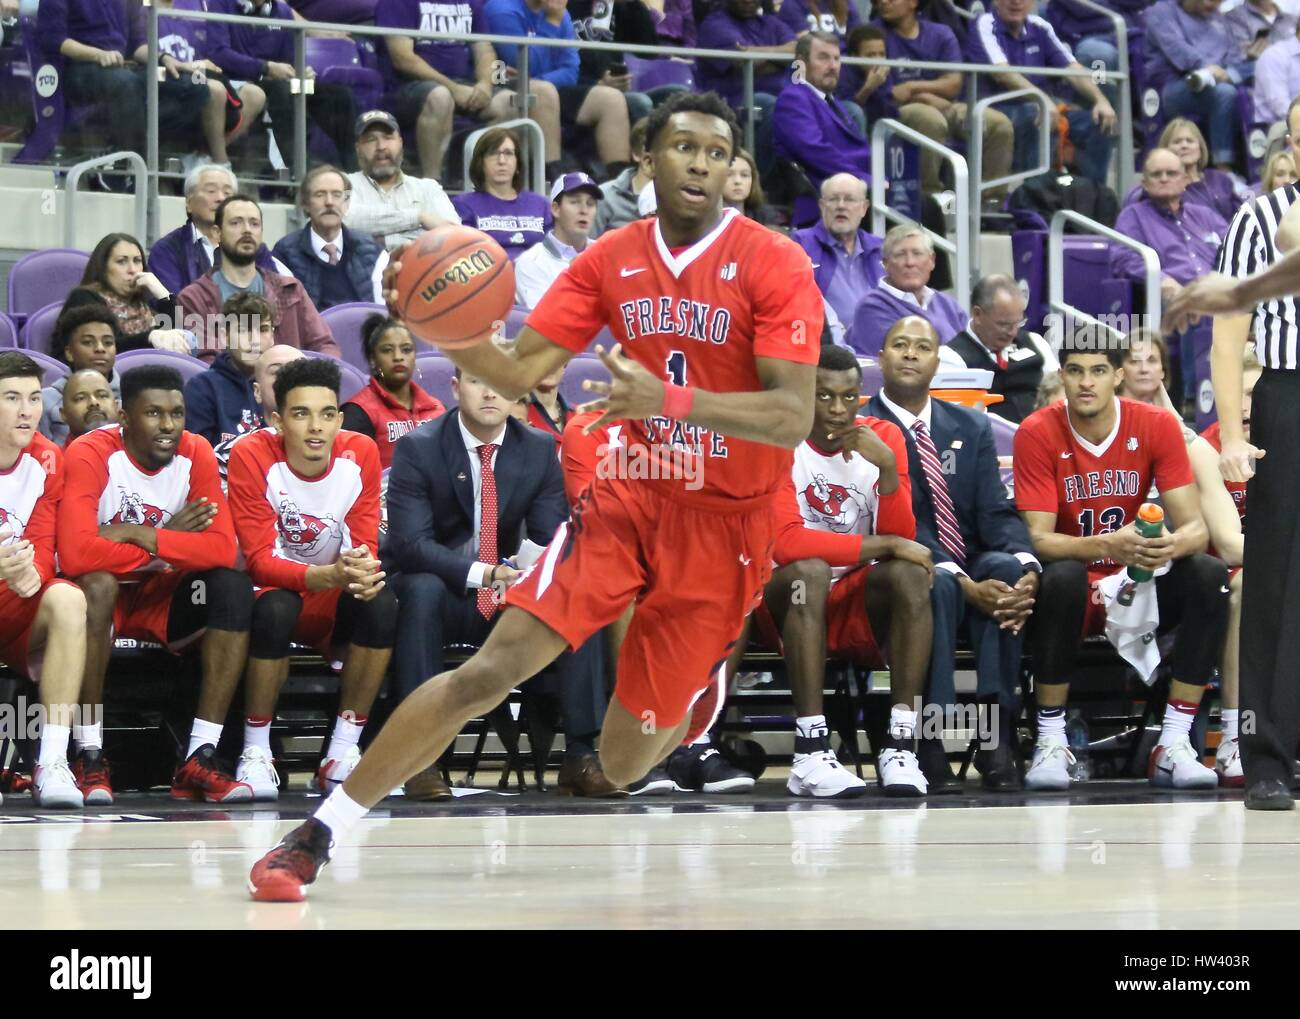 Fort Worth Texas, USA. 15th Mar, 2017. NIT basketball, tournament, NCAA, First Round, Bulldog guard Jaron Hopkins Stock Photo